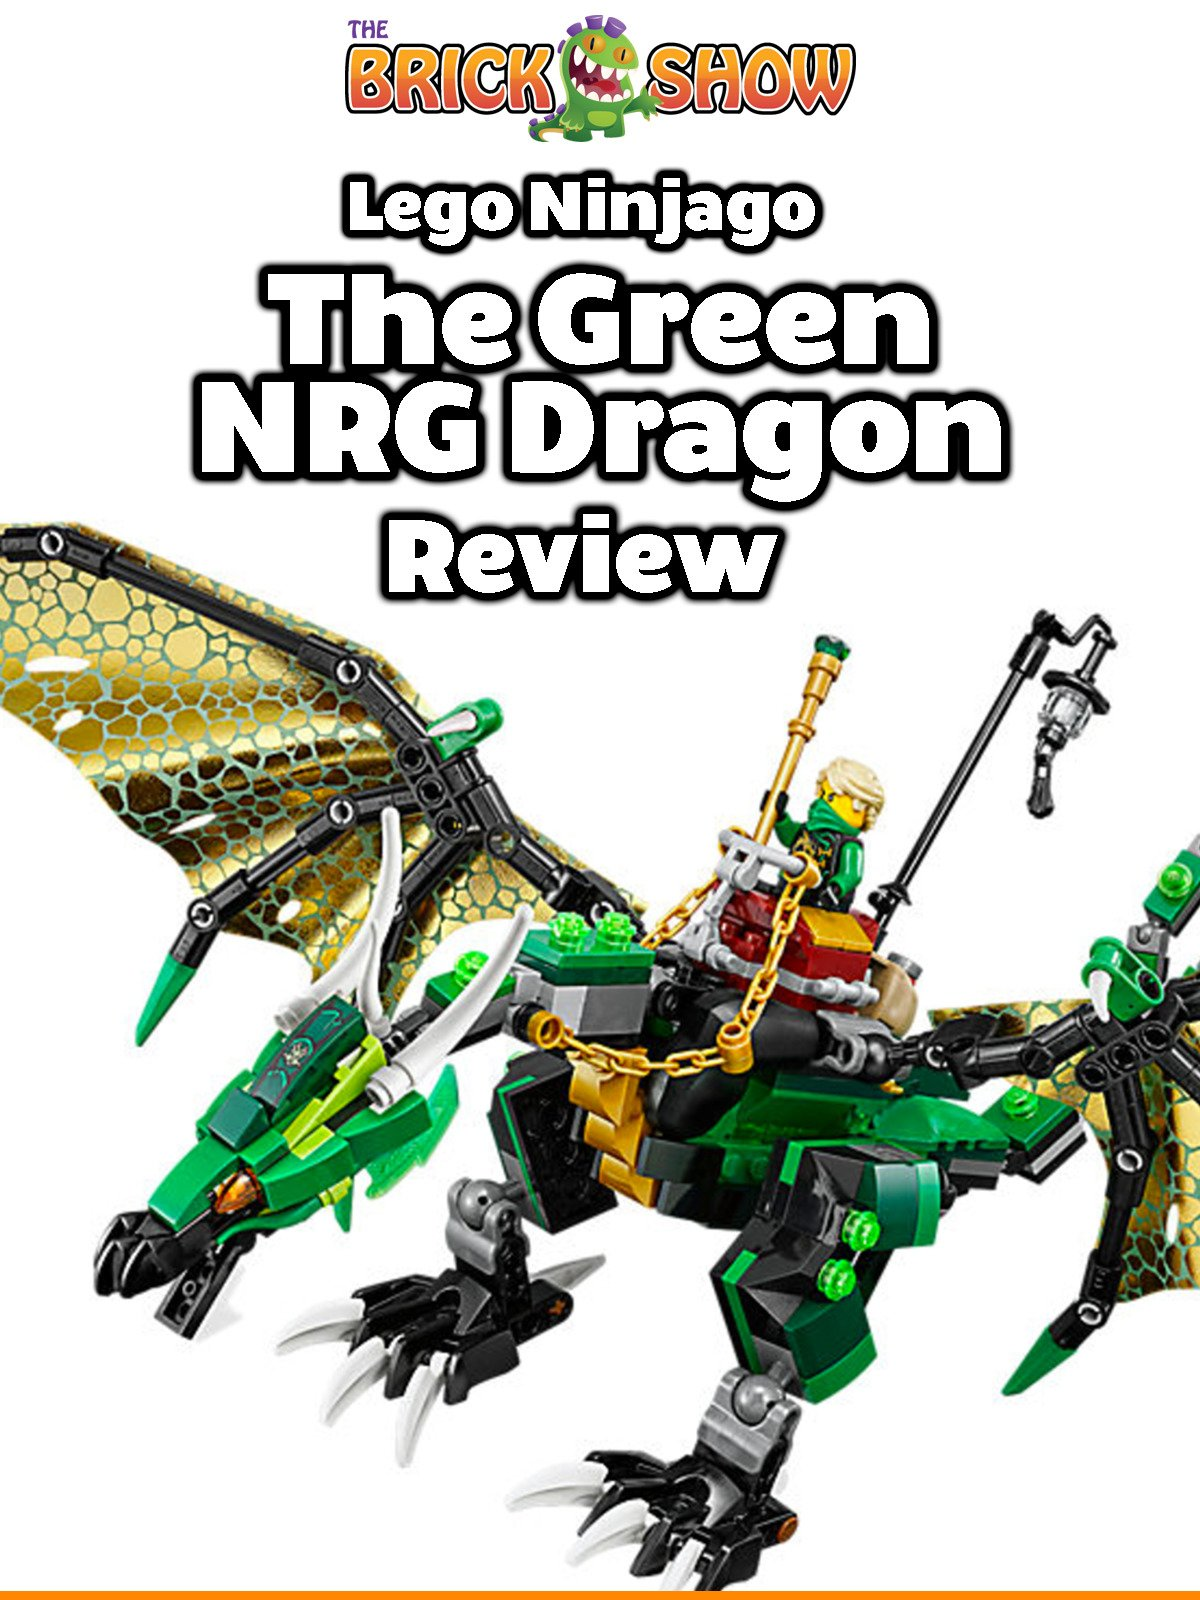 Watch Review: Lego Ninjago The Green NRG Dragon Review ...